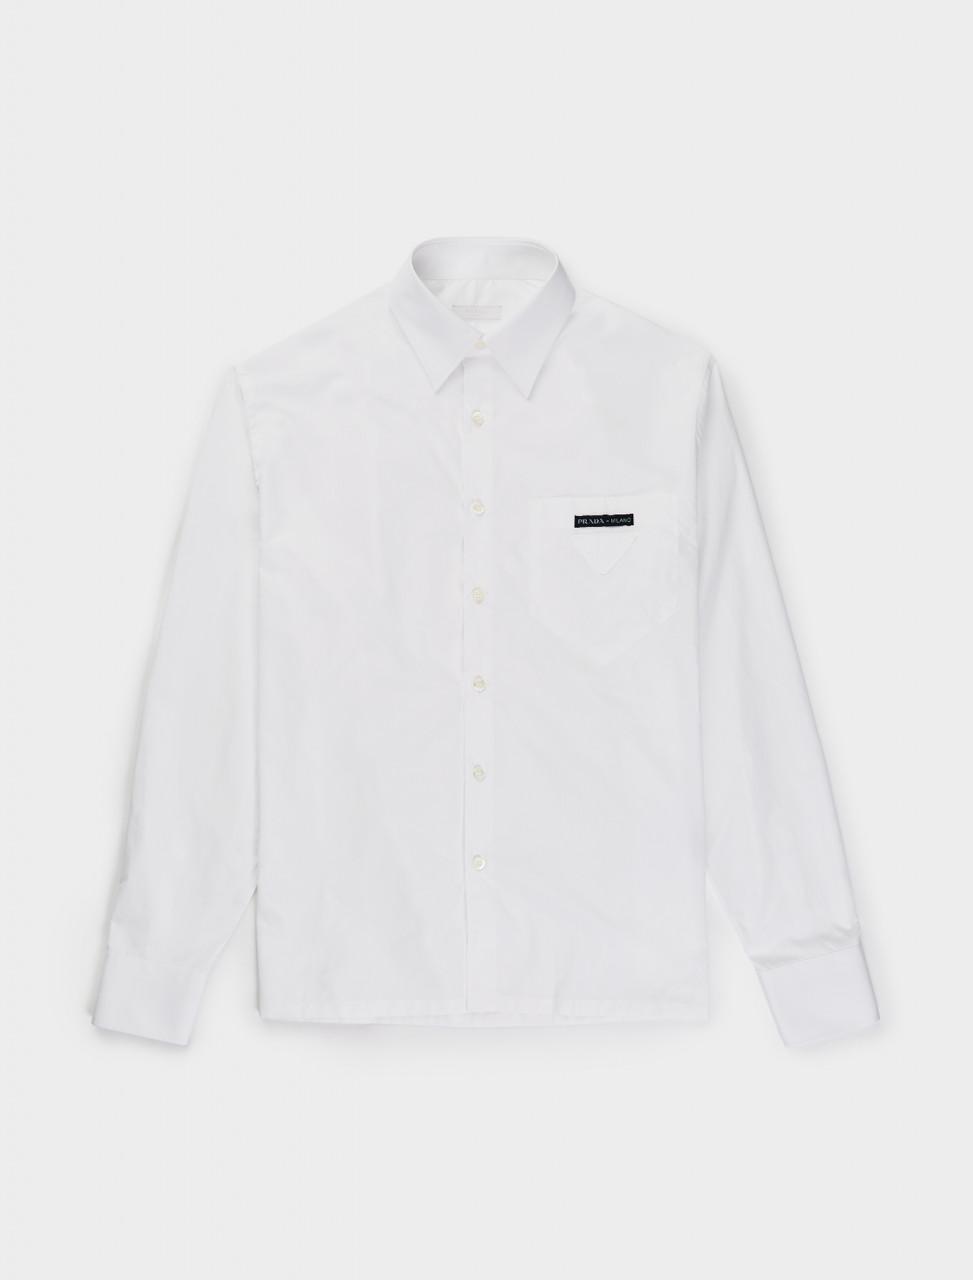 242-UCN300-1W7O-F0009 Prada Light Poplin Shirt in White